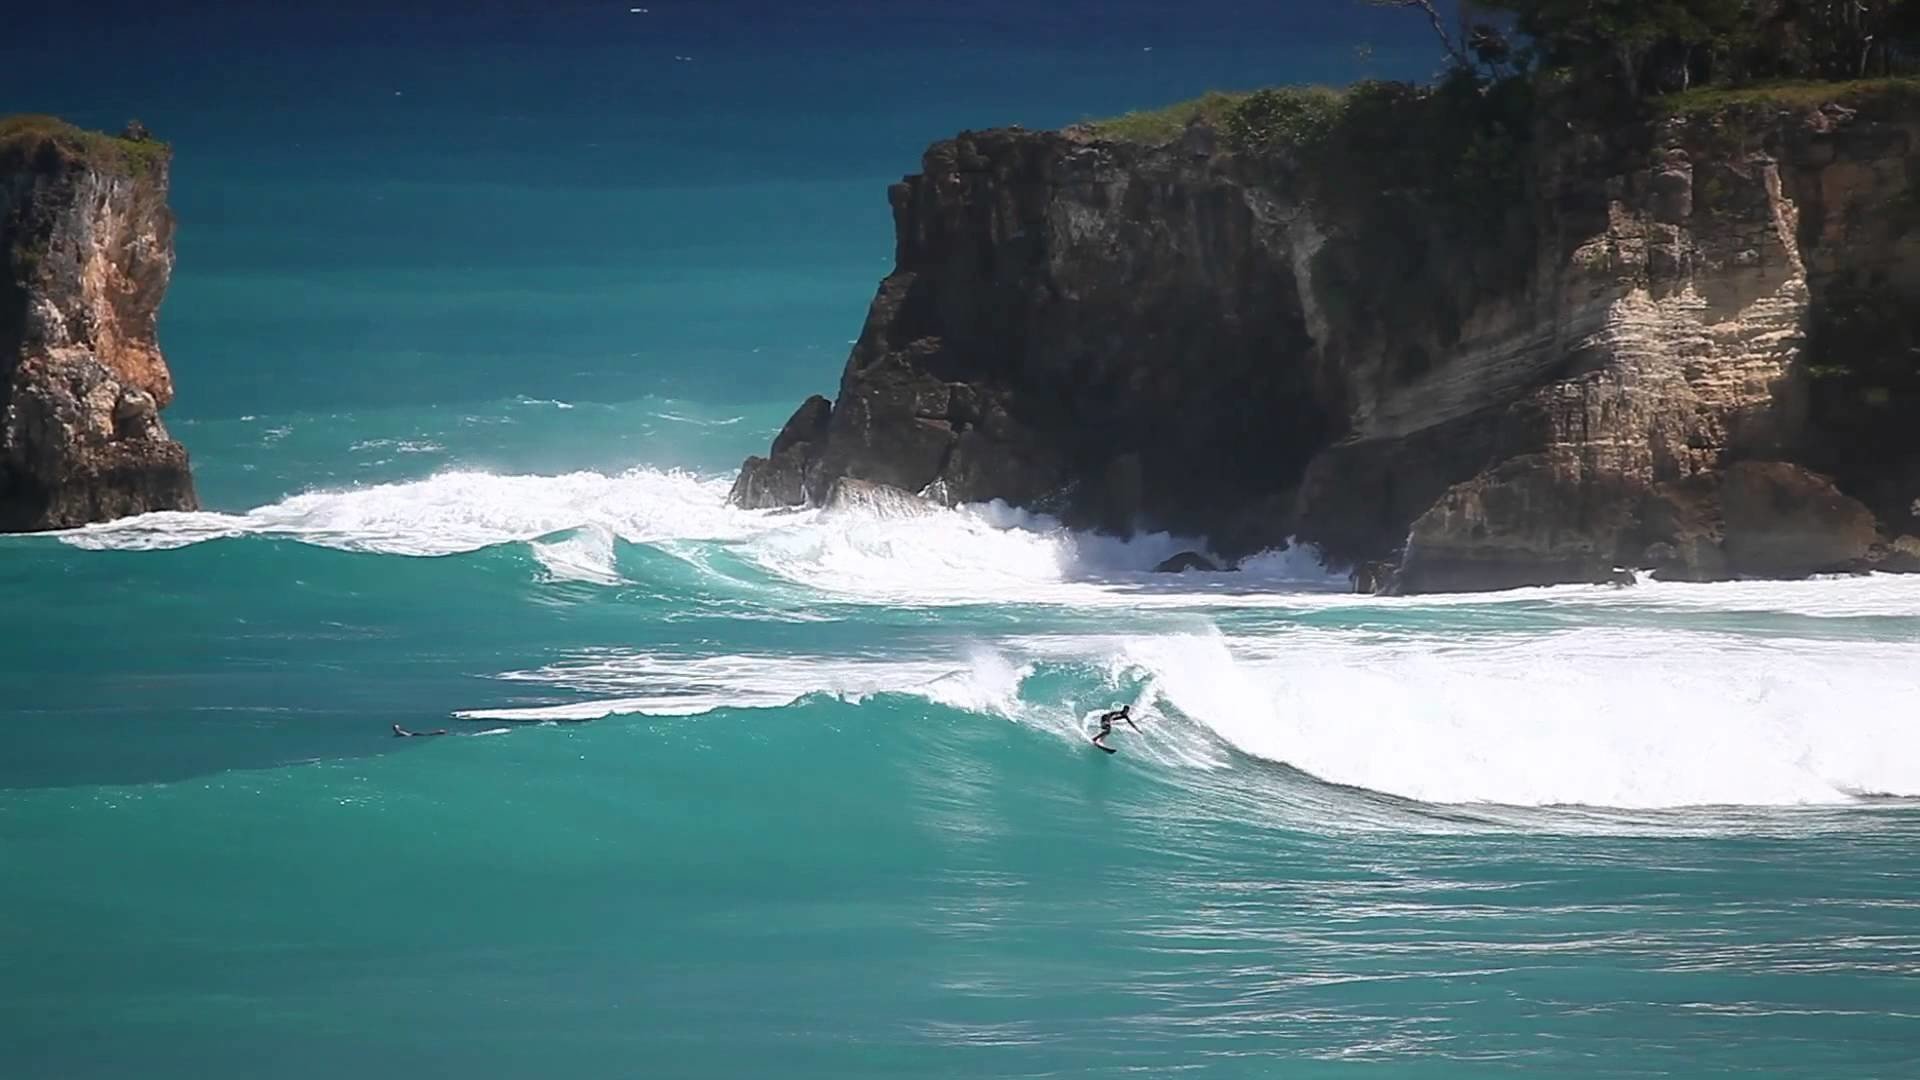 Surfing in big day, Dominican Republic [Surfholidays, серфинг] – YouTube